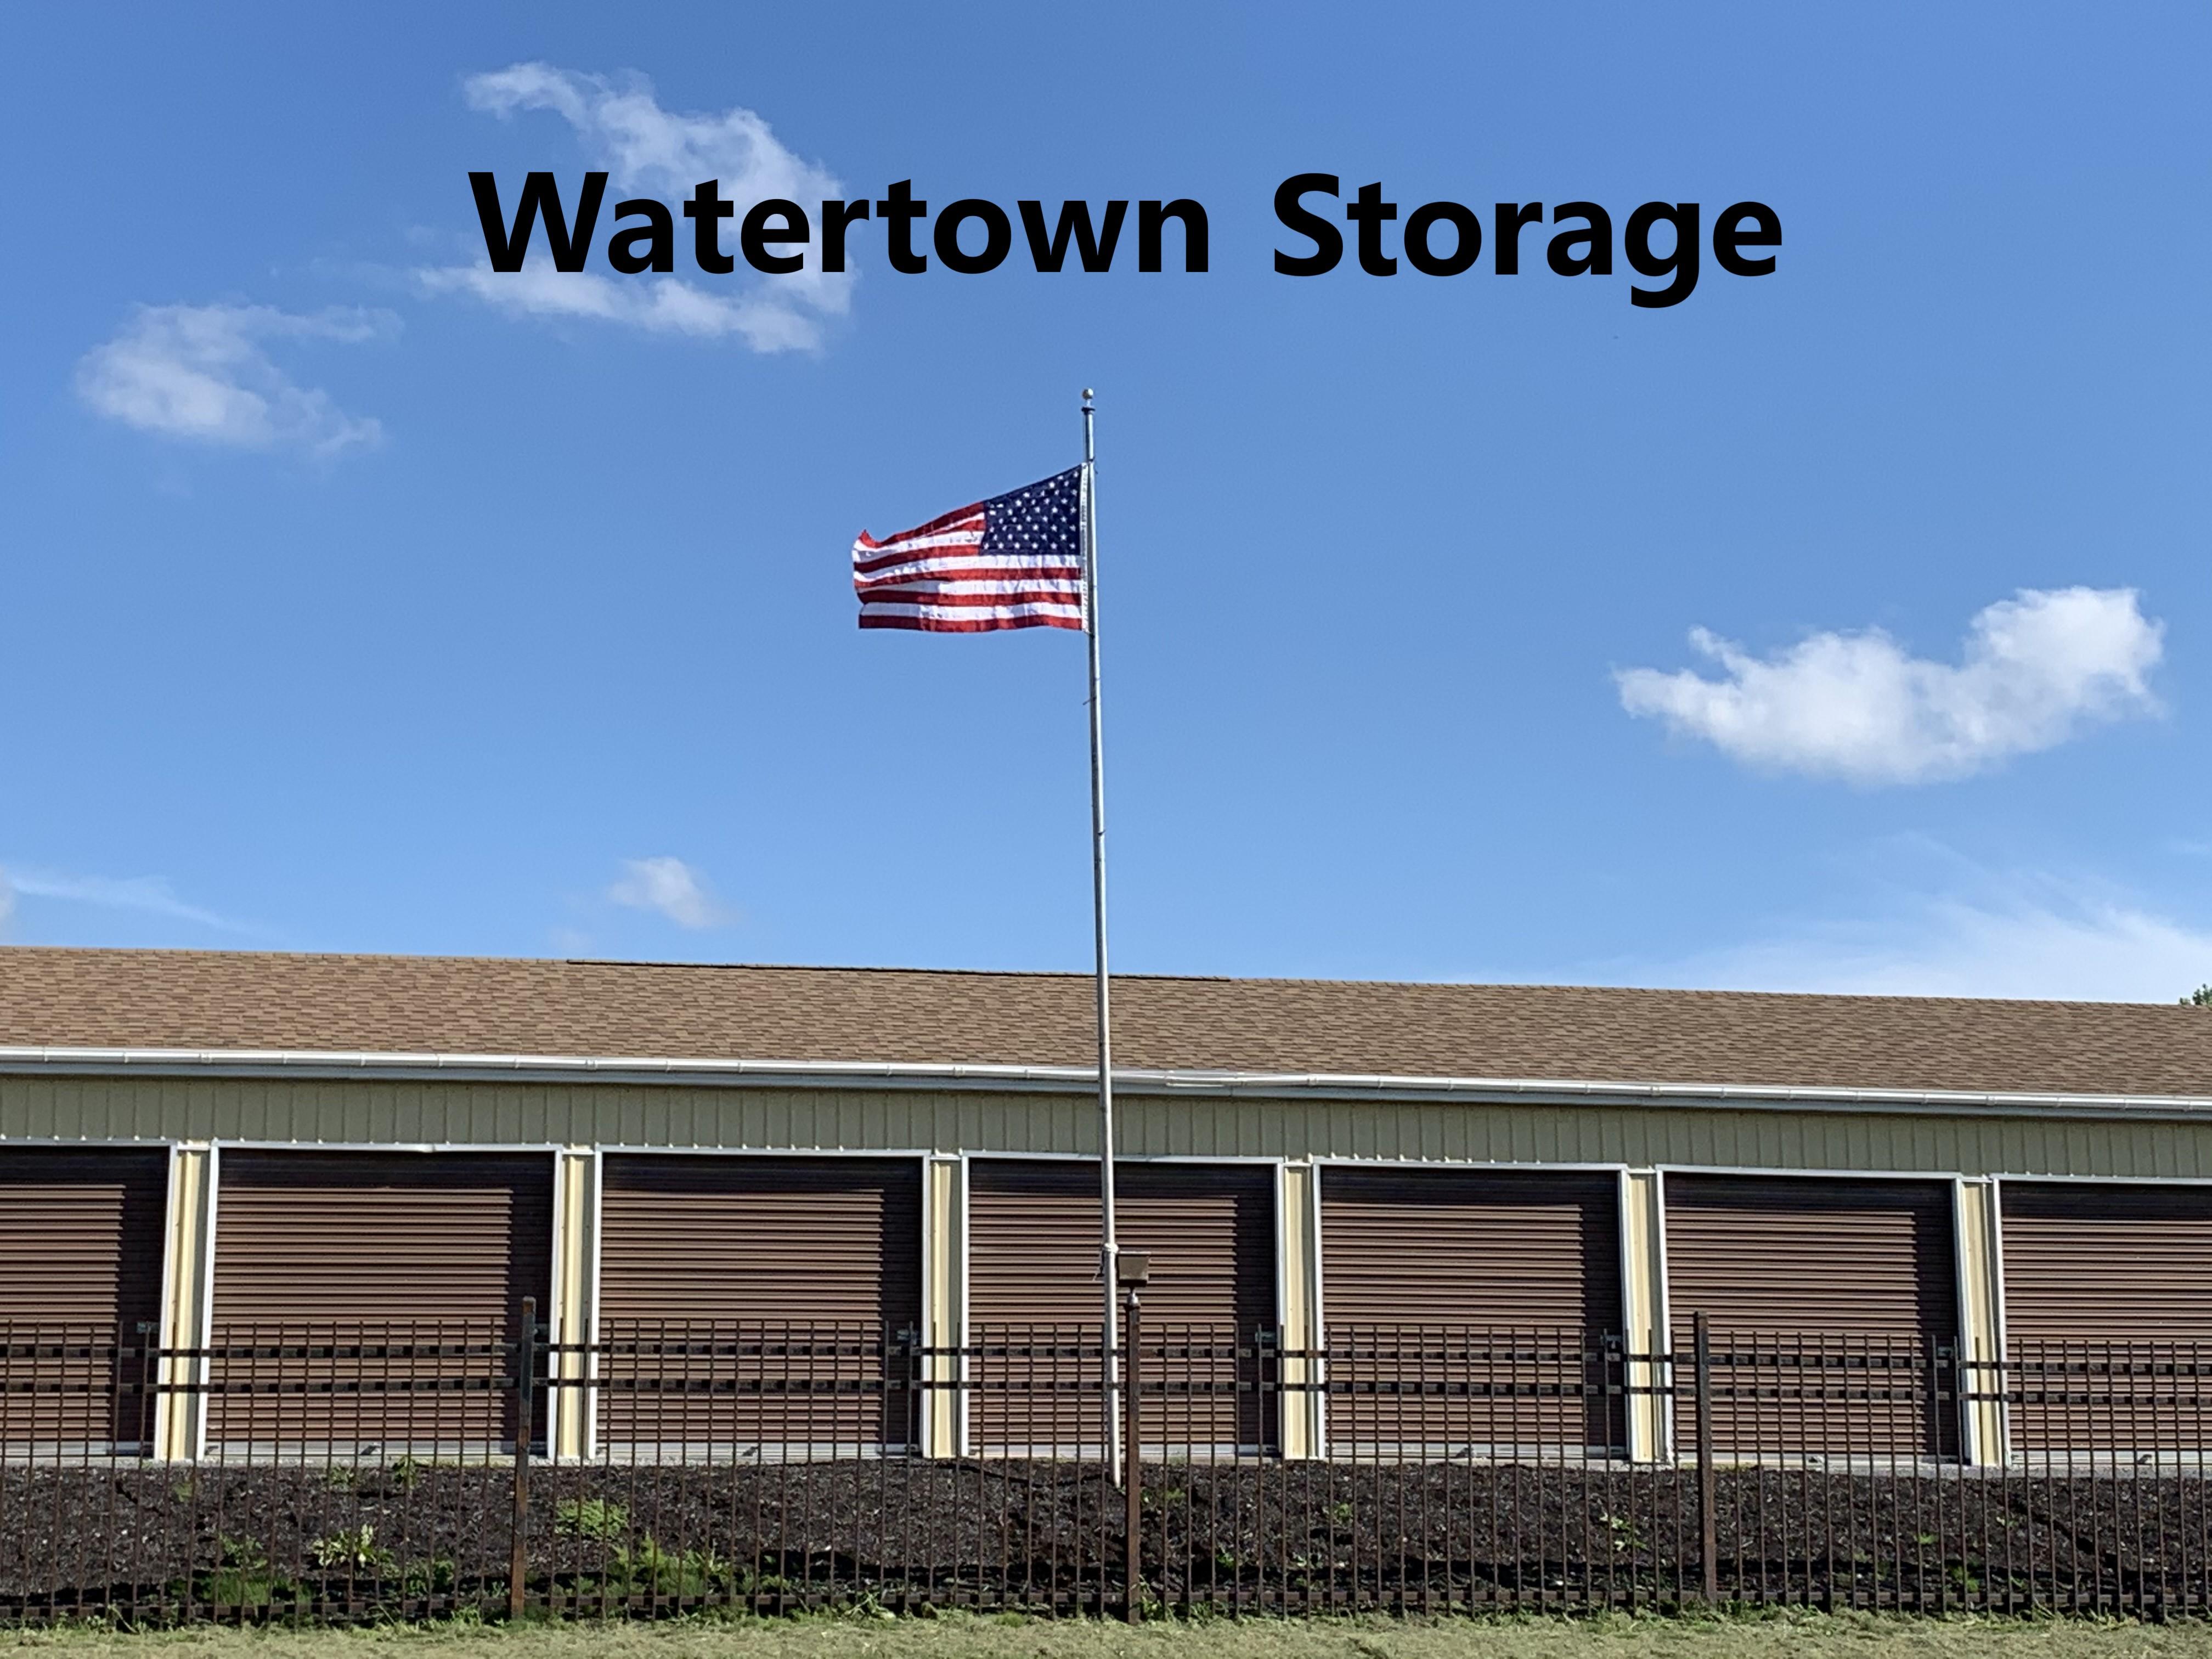 watertown storage flag